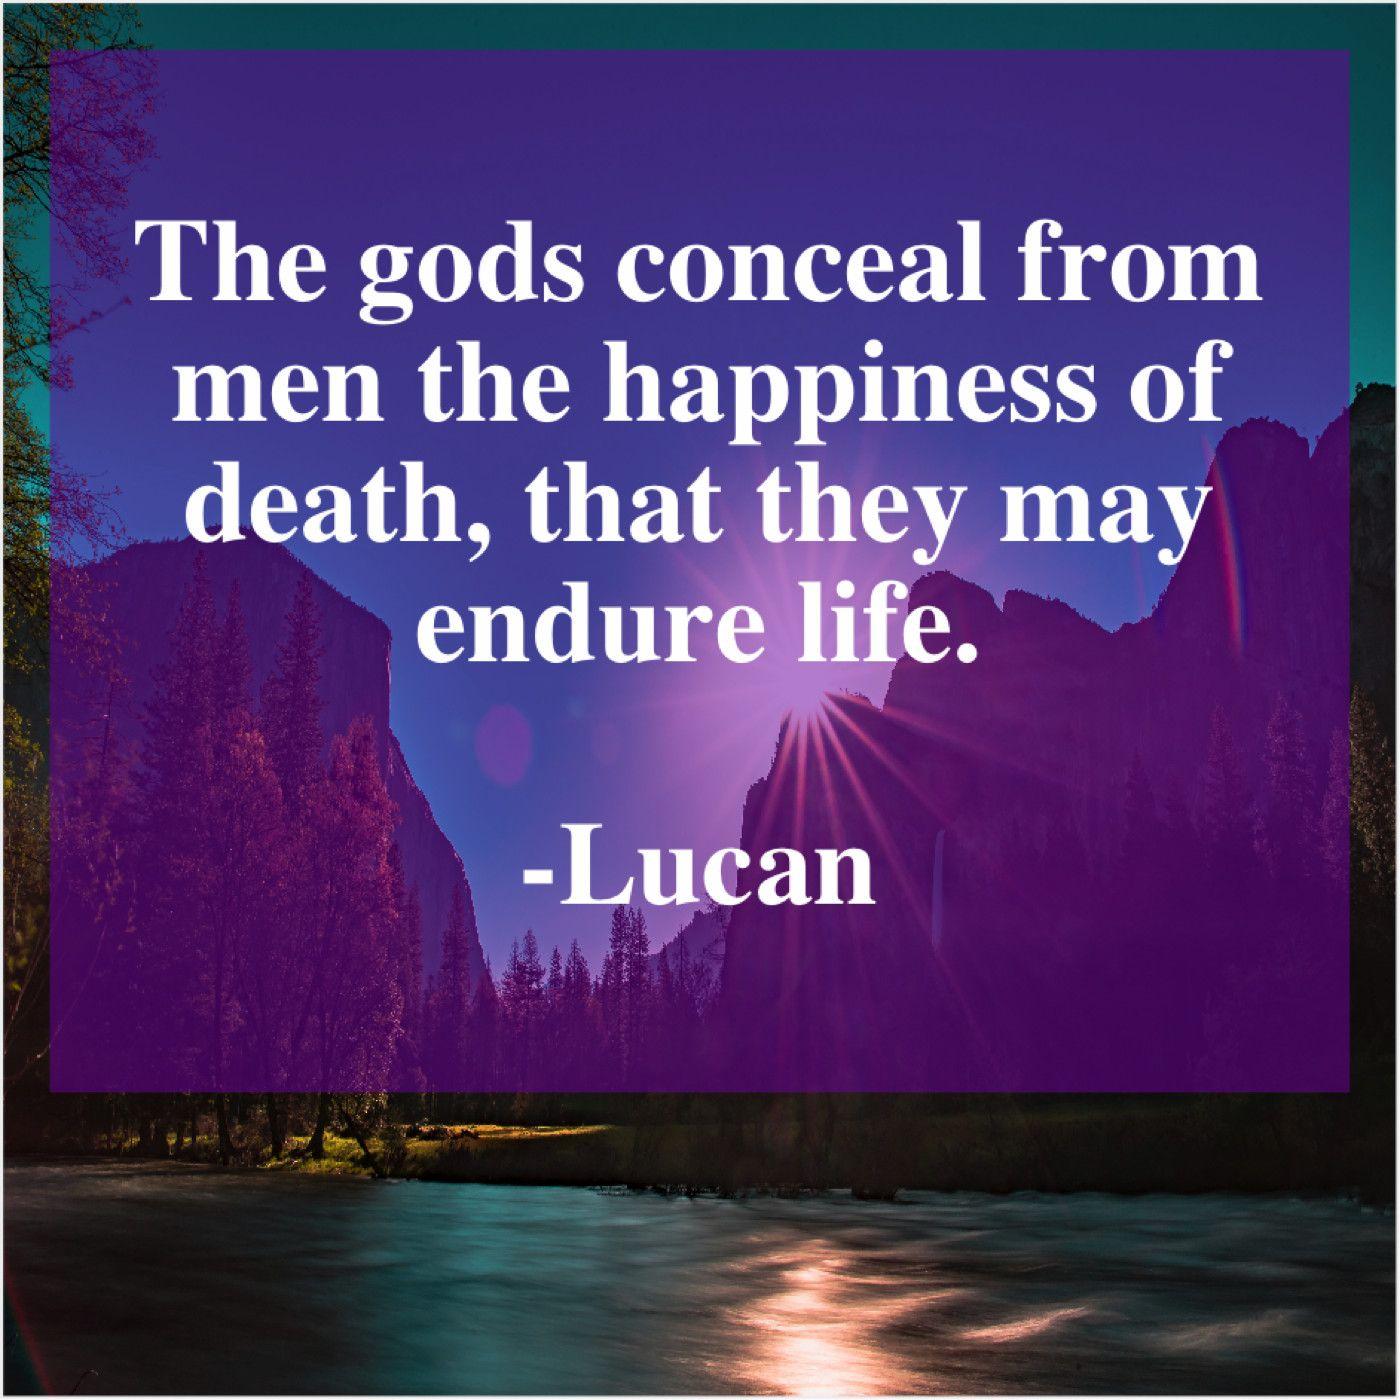 Lucan The Gods Conceal From Men Lucan Concealed Men